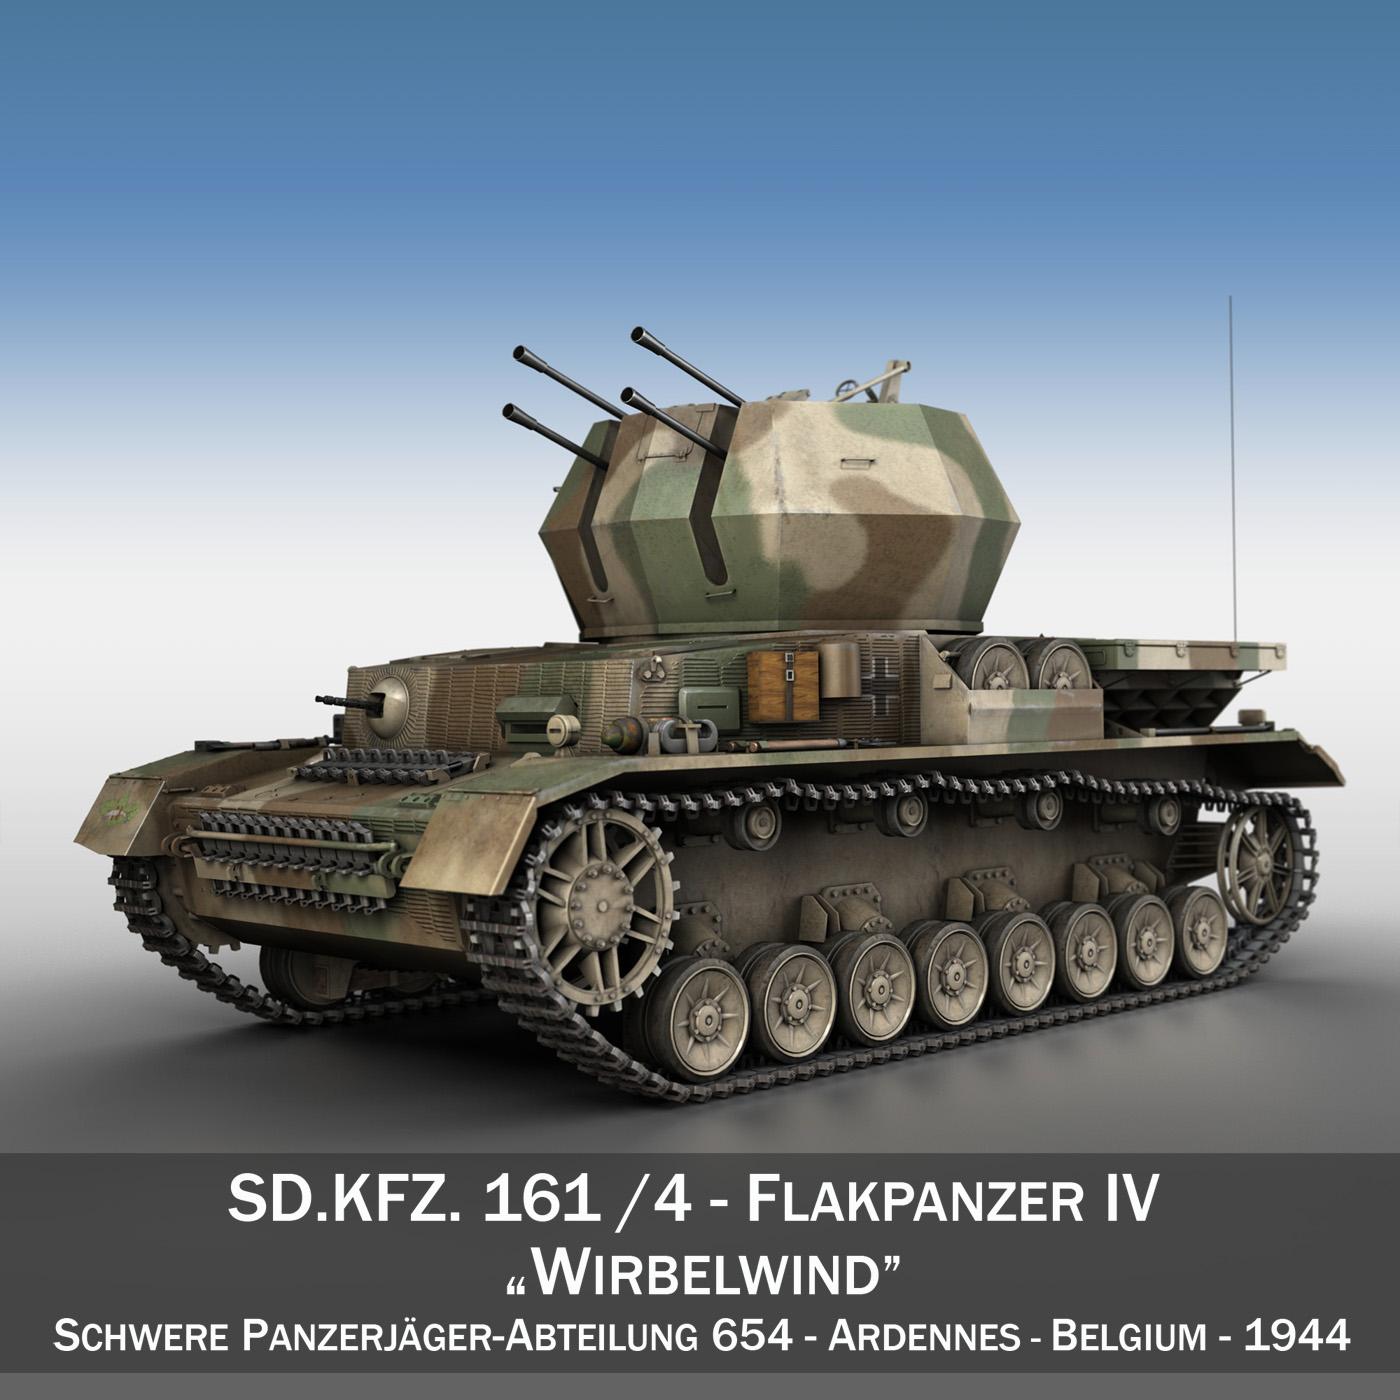 Flakpanzer IV - Wirbelwind - sPzJgAbt 654 3d model 3ds fbx c4d lwo lws lw obj 282304